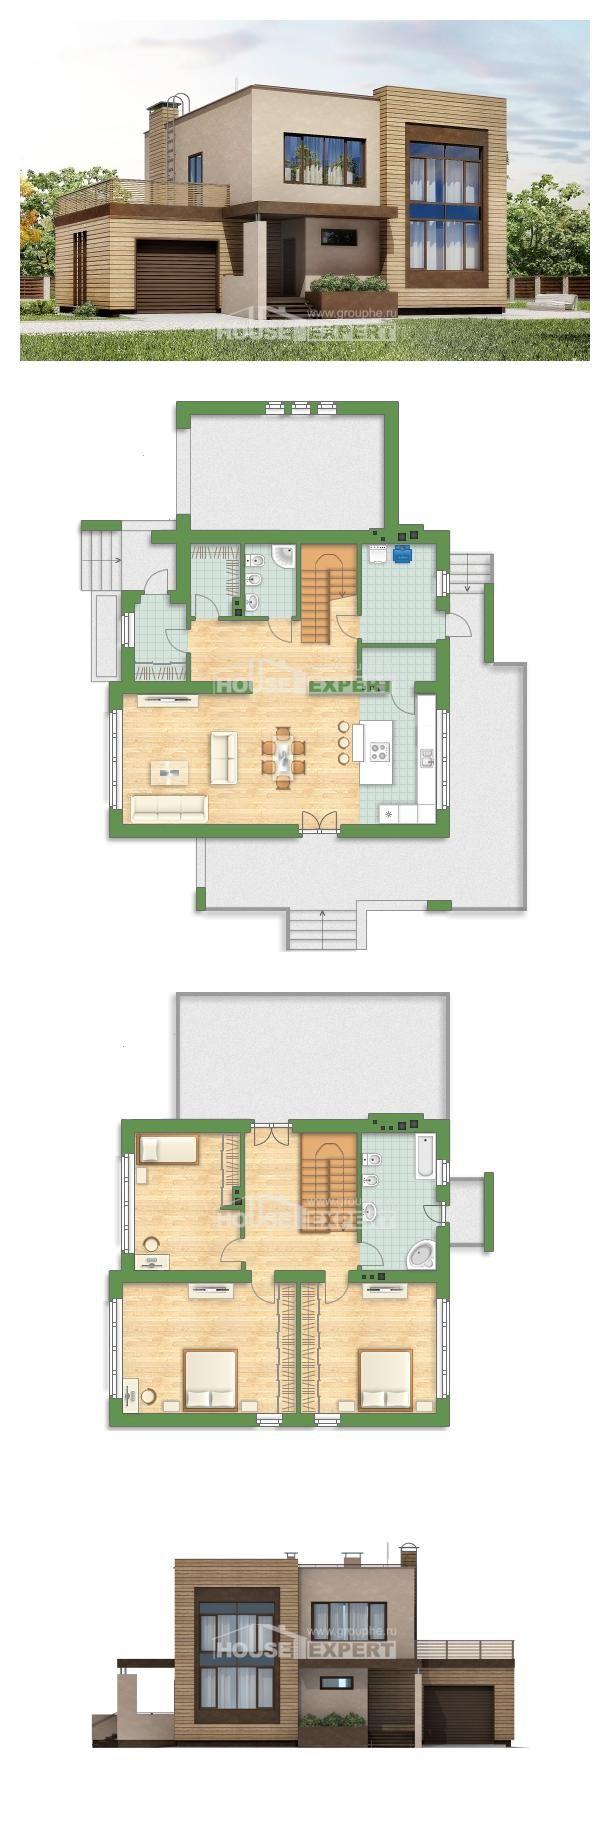 проект дома 220 003 л House Expert Cabin House Plans House Layout Plans House Exterior